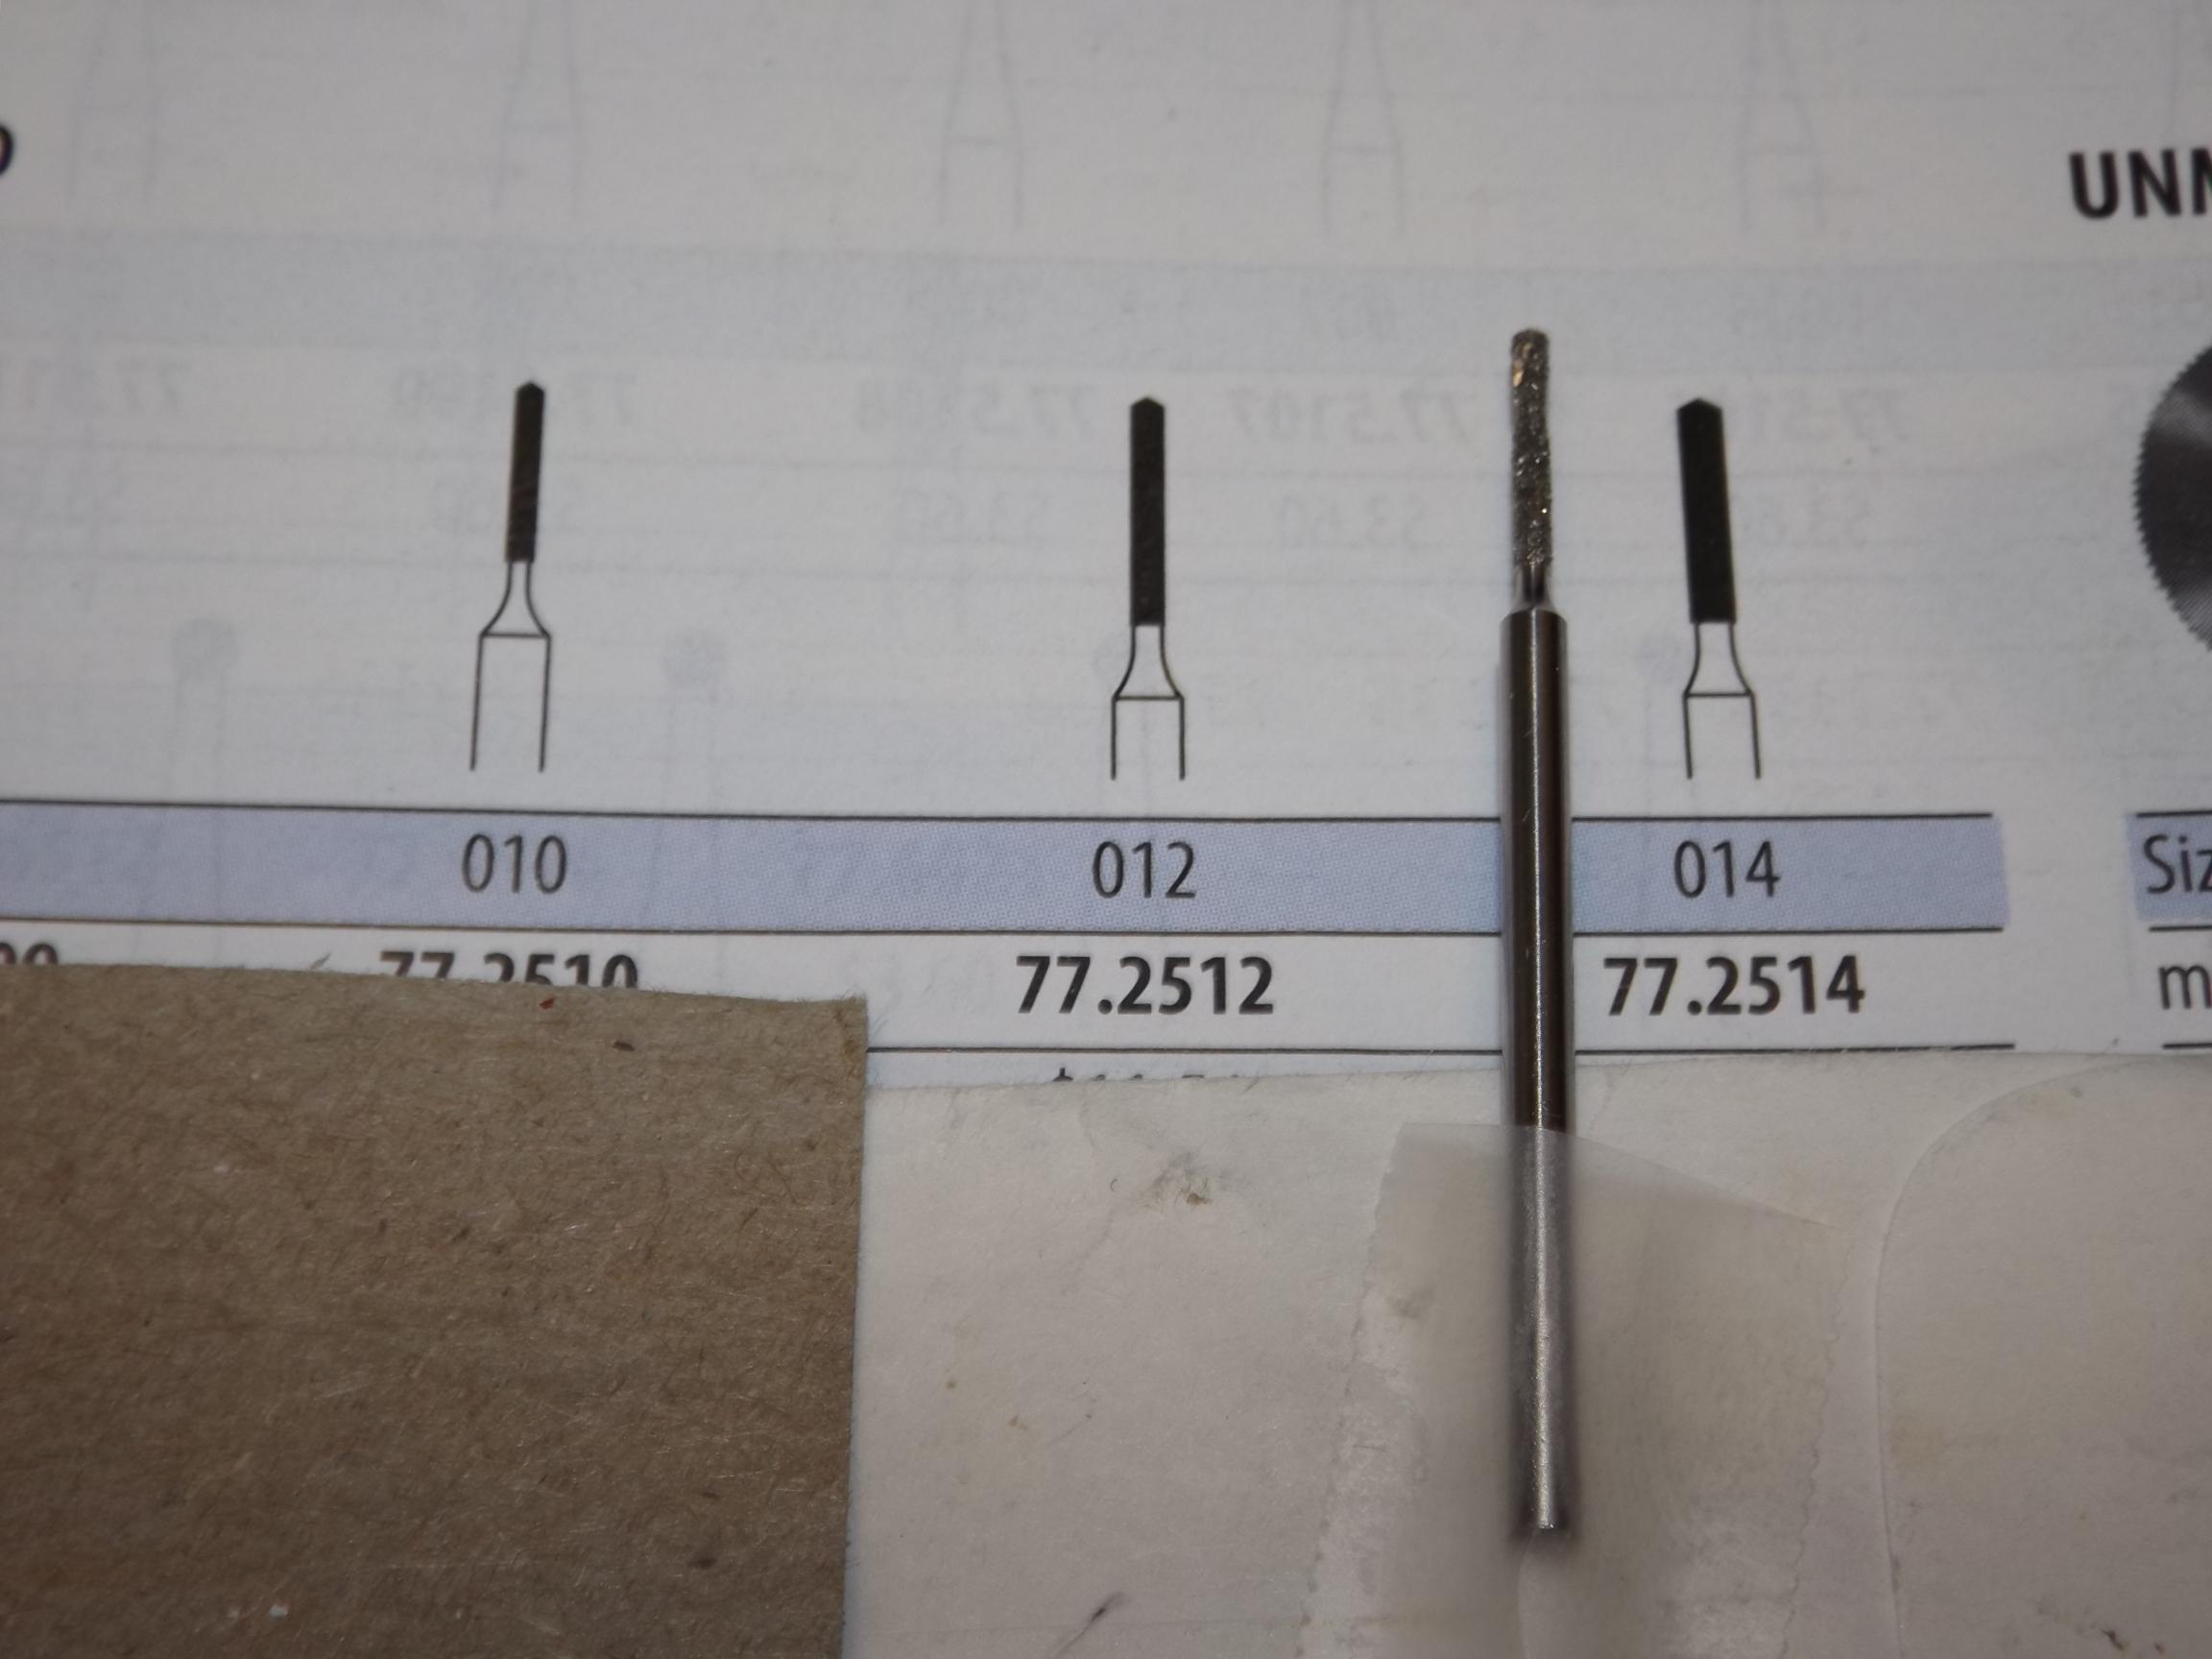 DR77.2514 Panther Brand, Diamond Twist Drill-Size 014 #77D- Grobet #77.2514